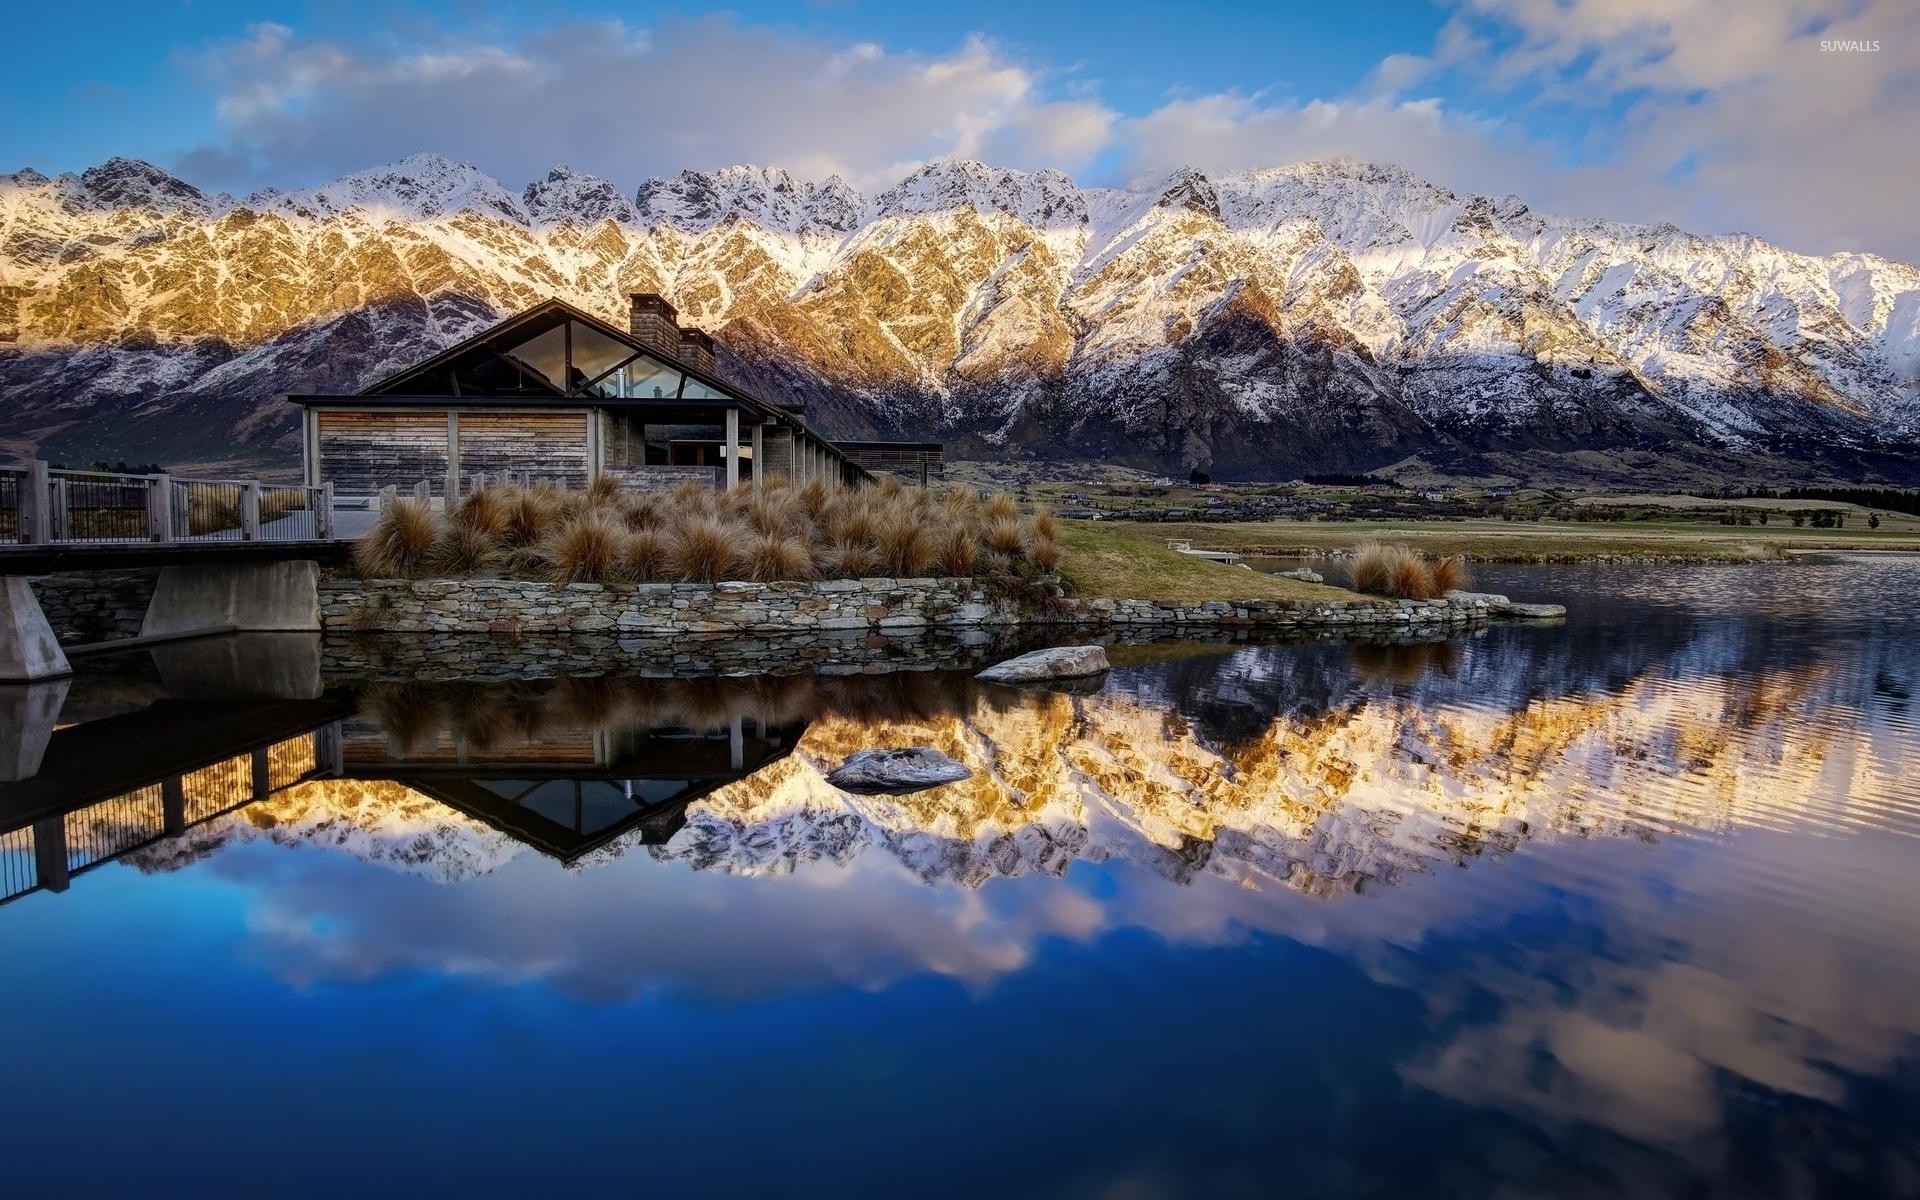 wallpaper amazing mountain lake - photo #35